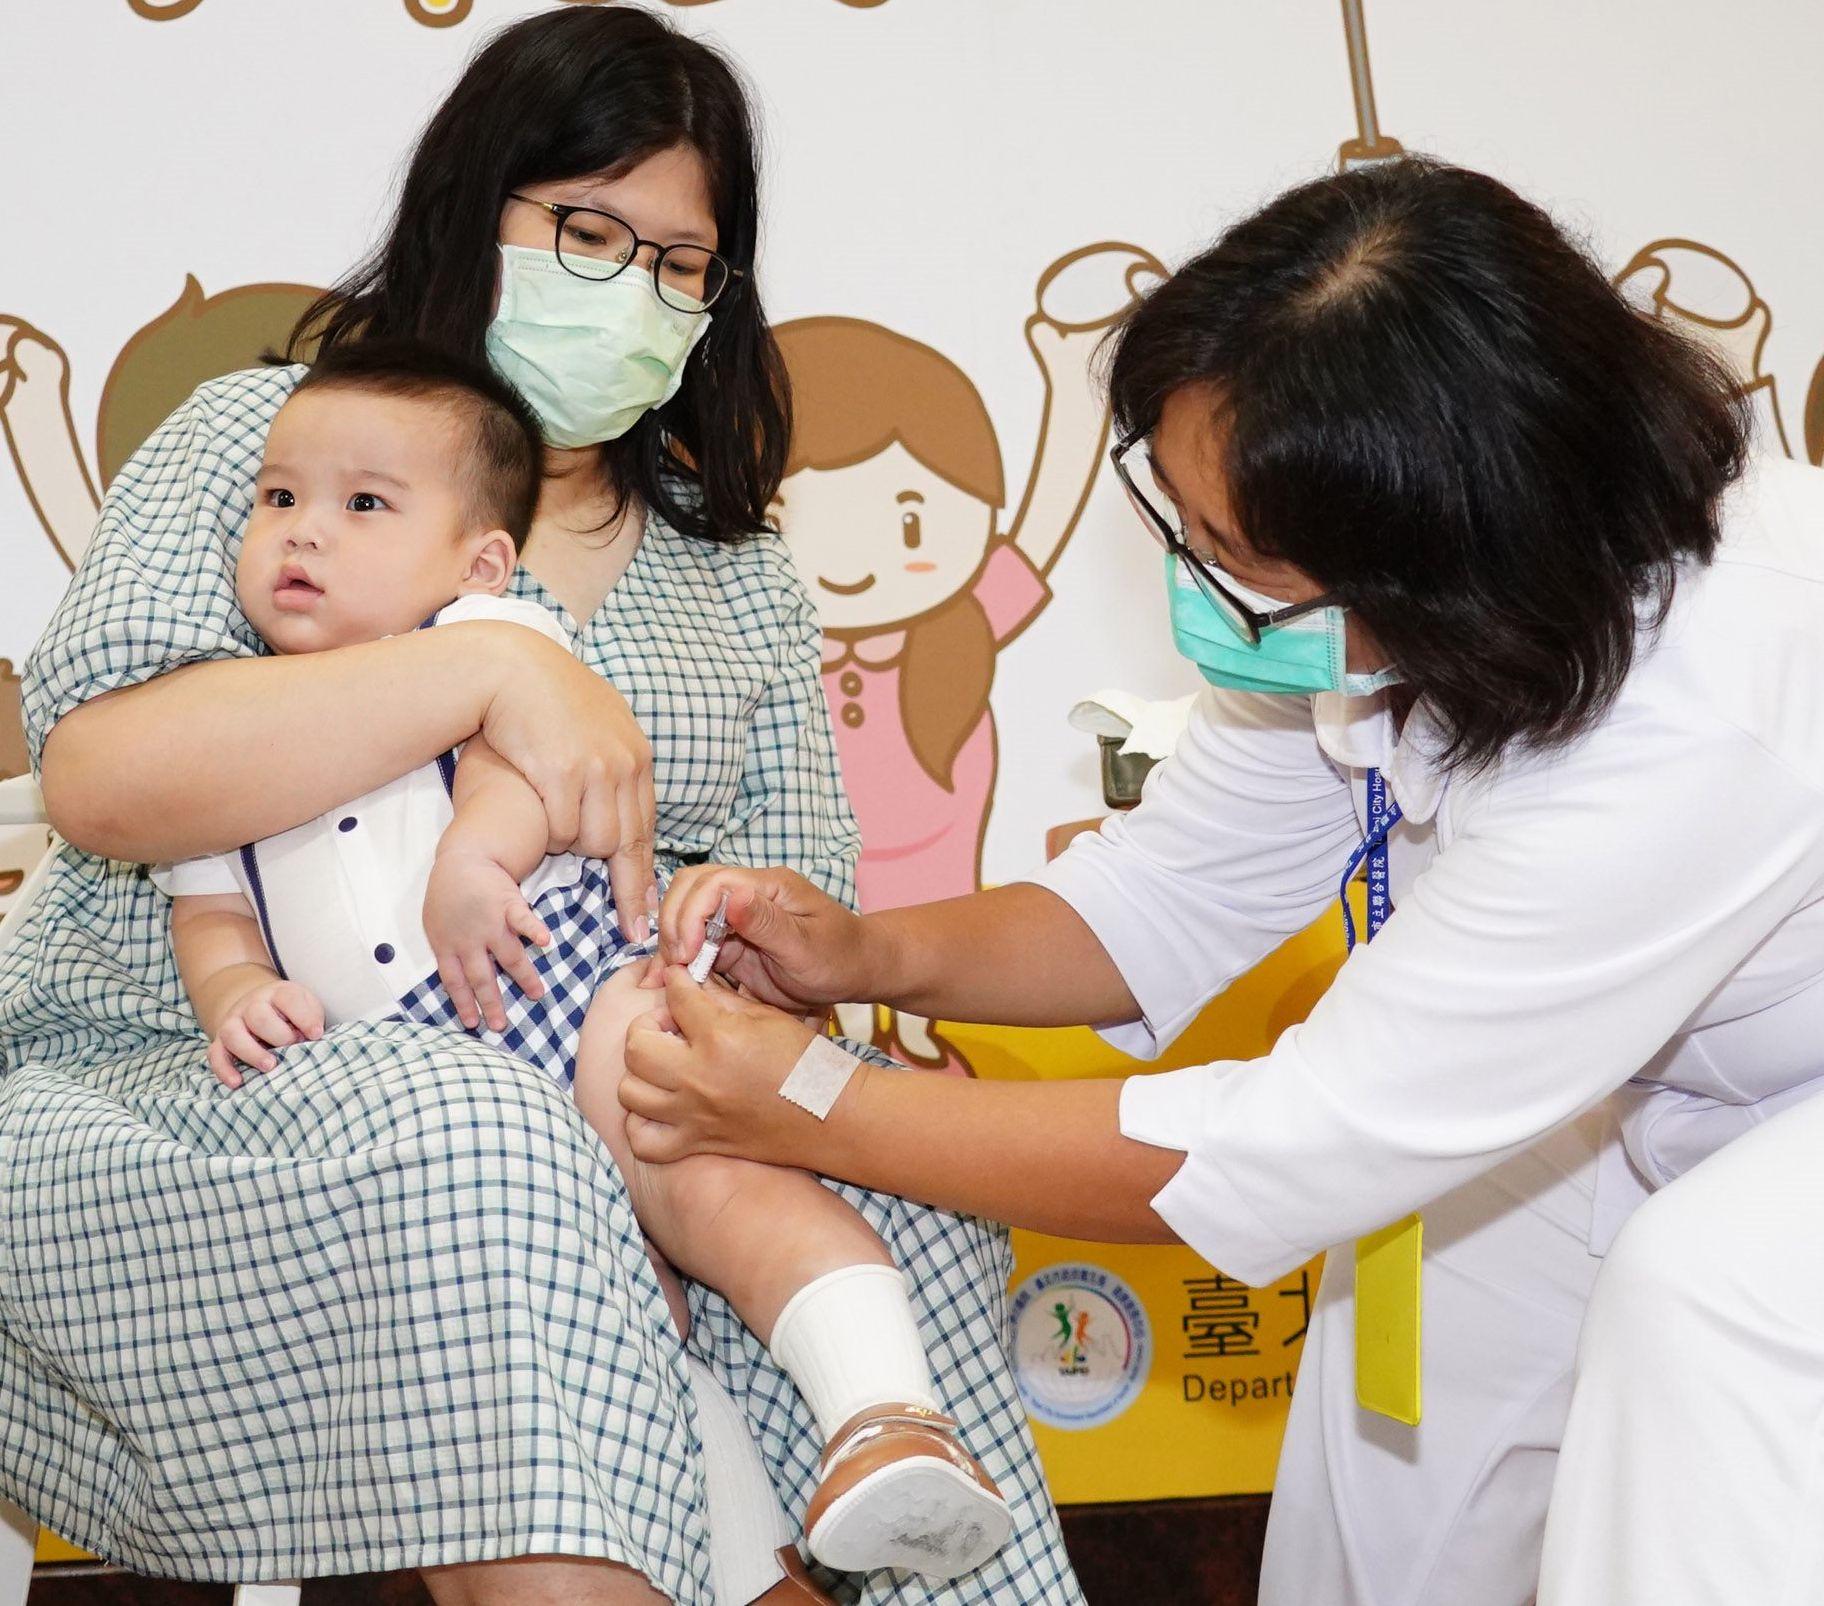 A nurse administering flu shot